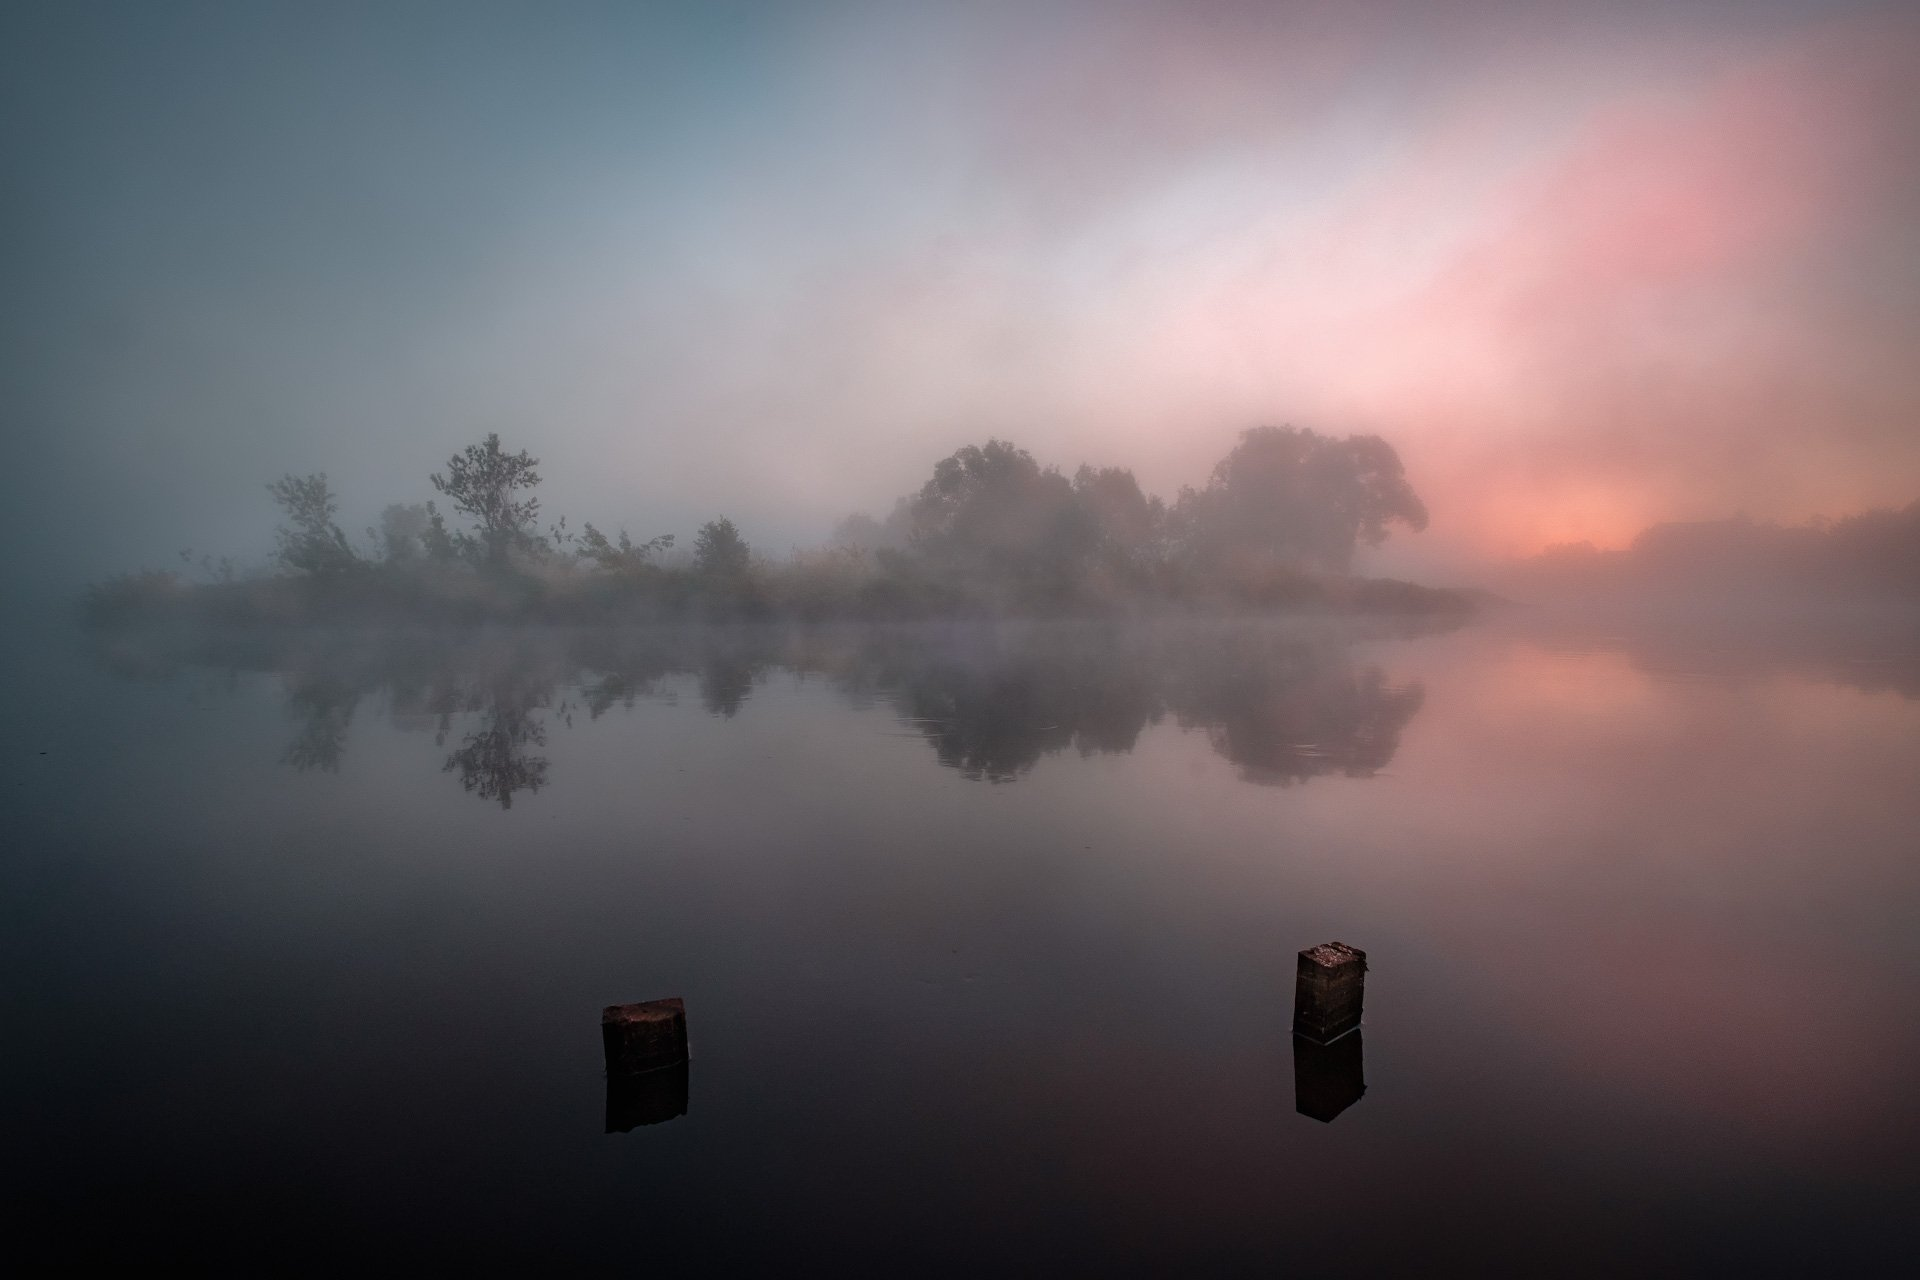 пейзаж, природа, заря, рассвет, туман, дубна, река, утро, Андрей Чиж